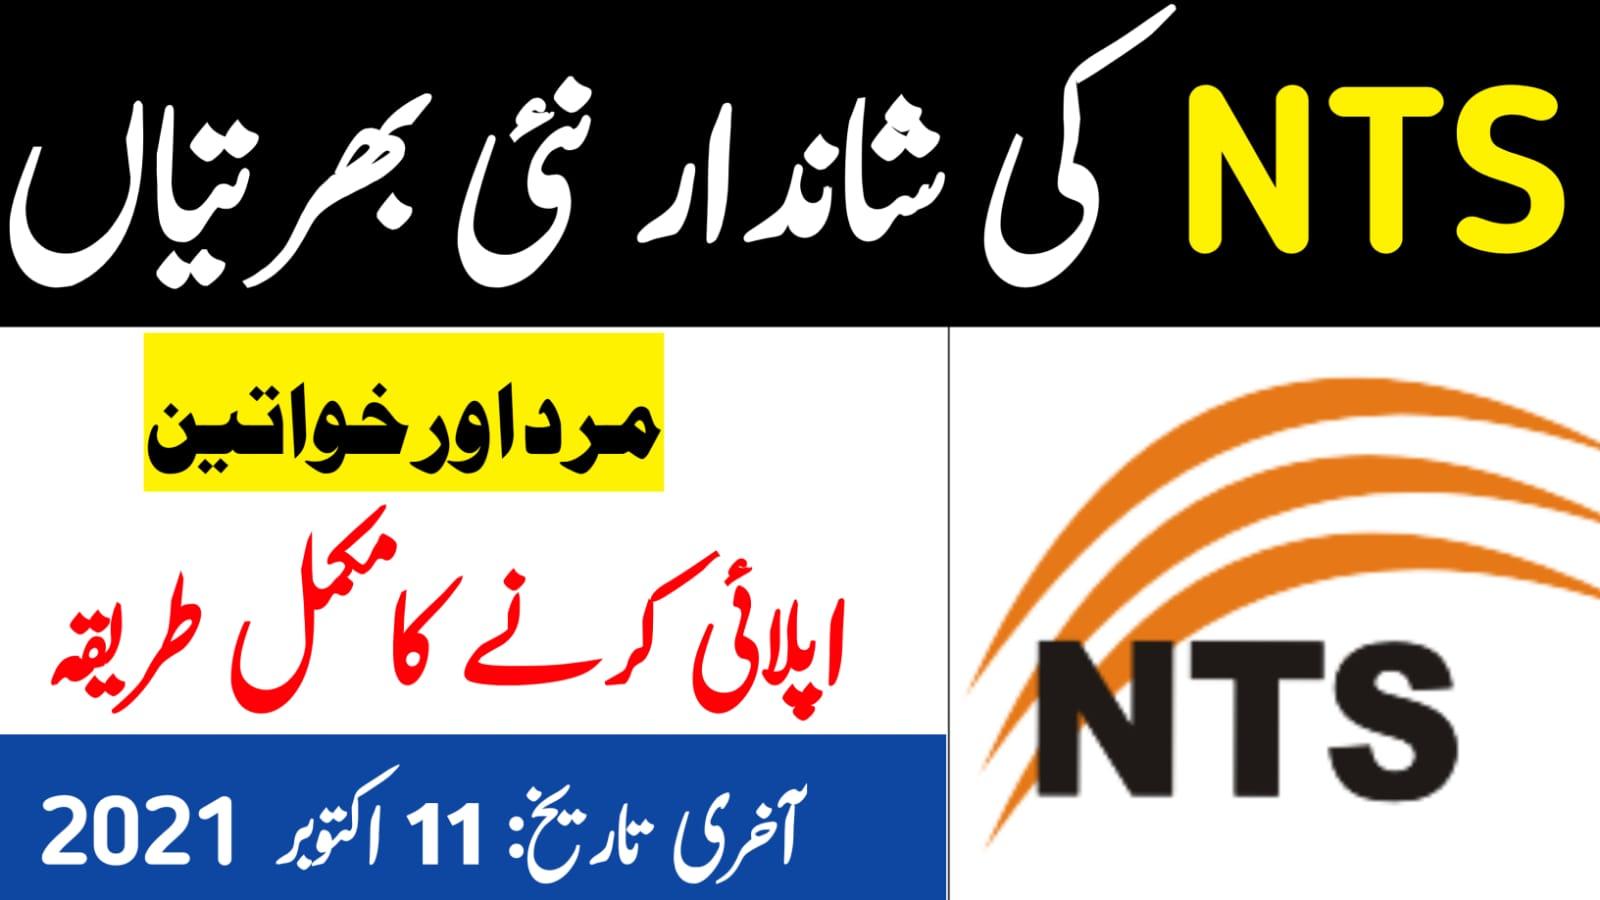 NTS Latest Jobs in Pakistan 2021